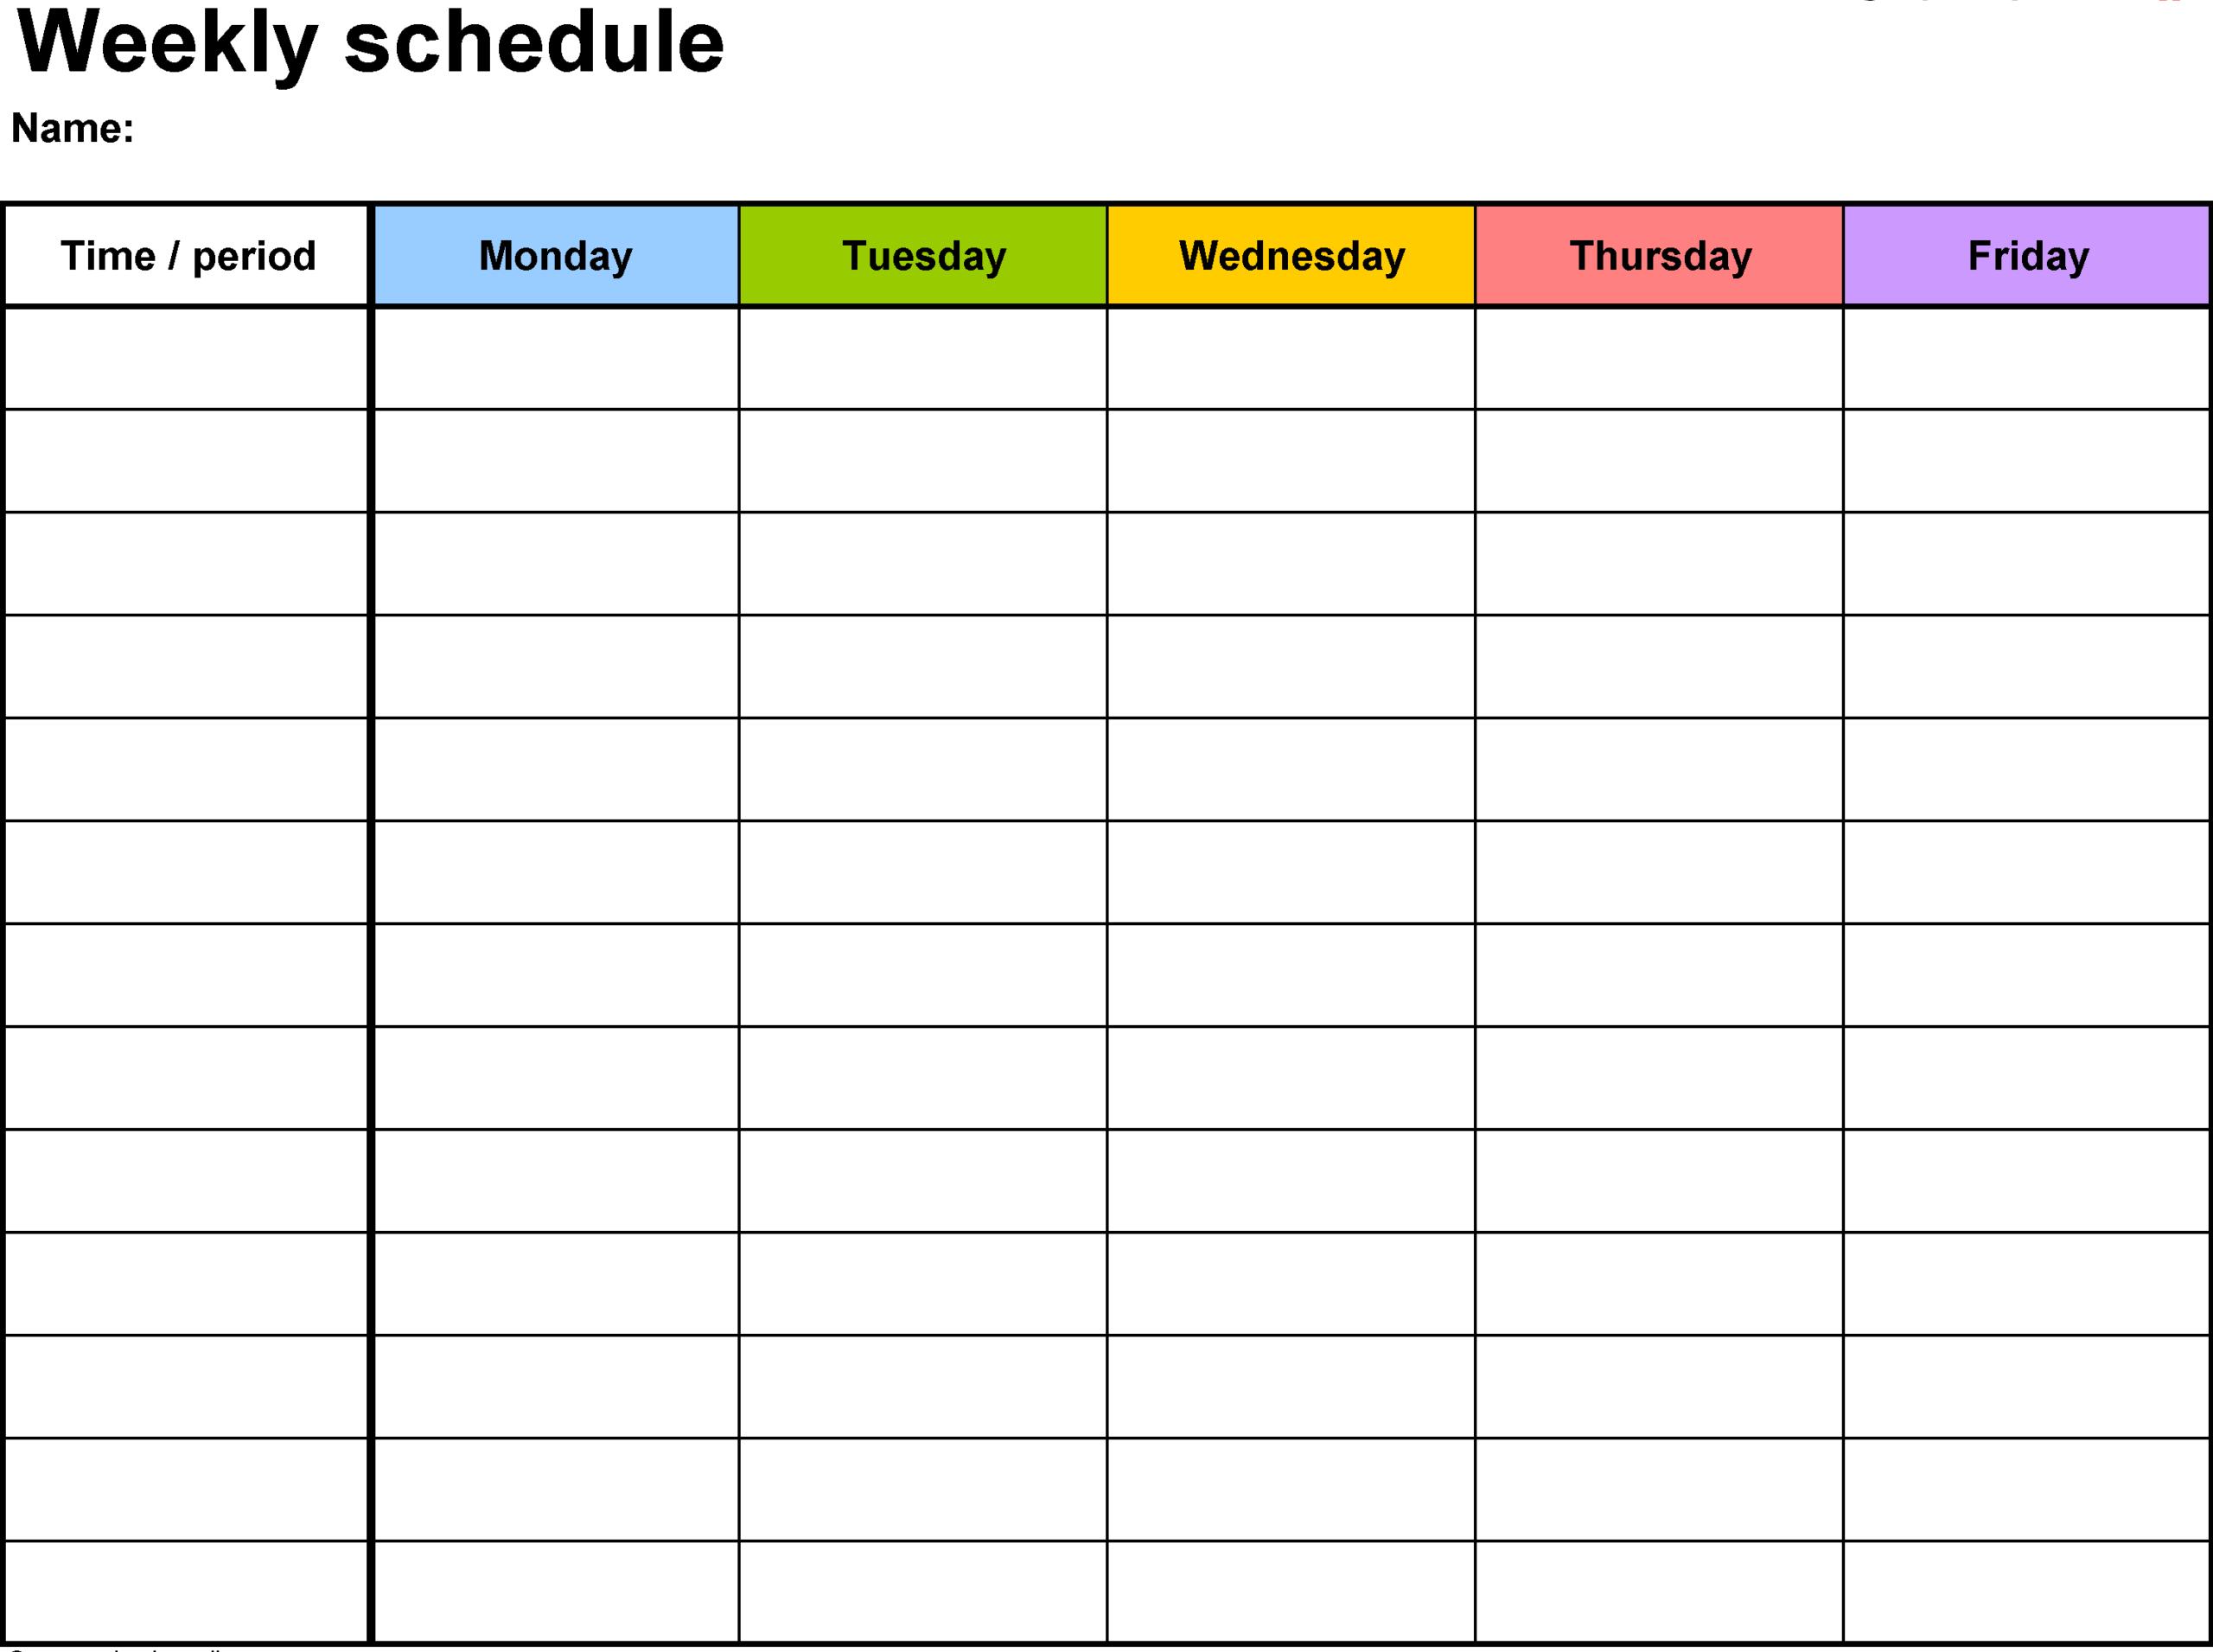 Free Printable Calendar With Time Slots | Calendar  Printable Weekly Calendar With Time Slots